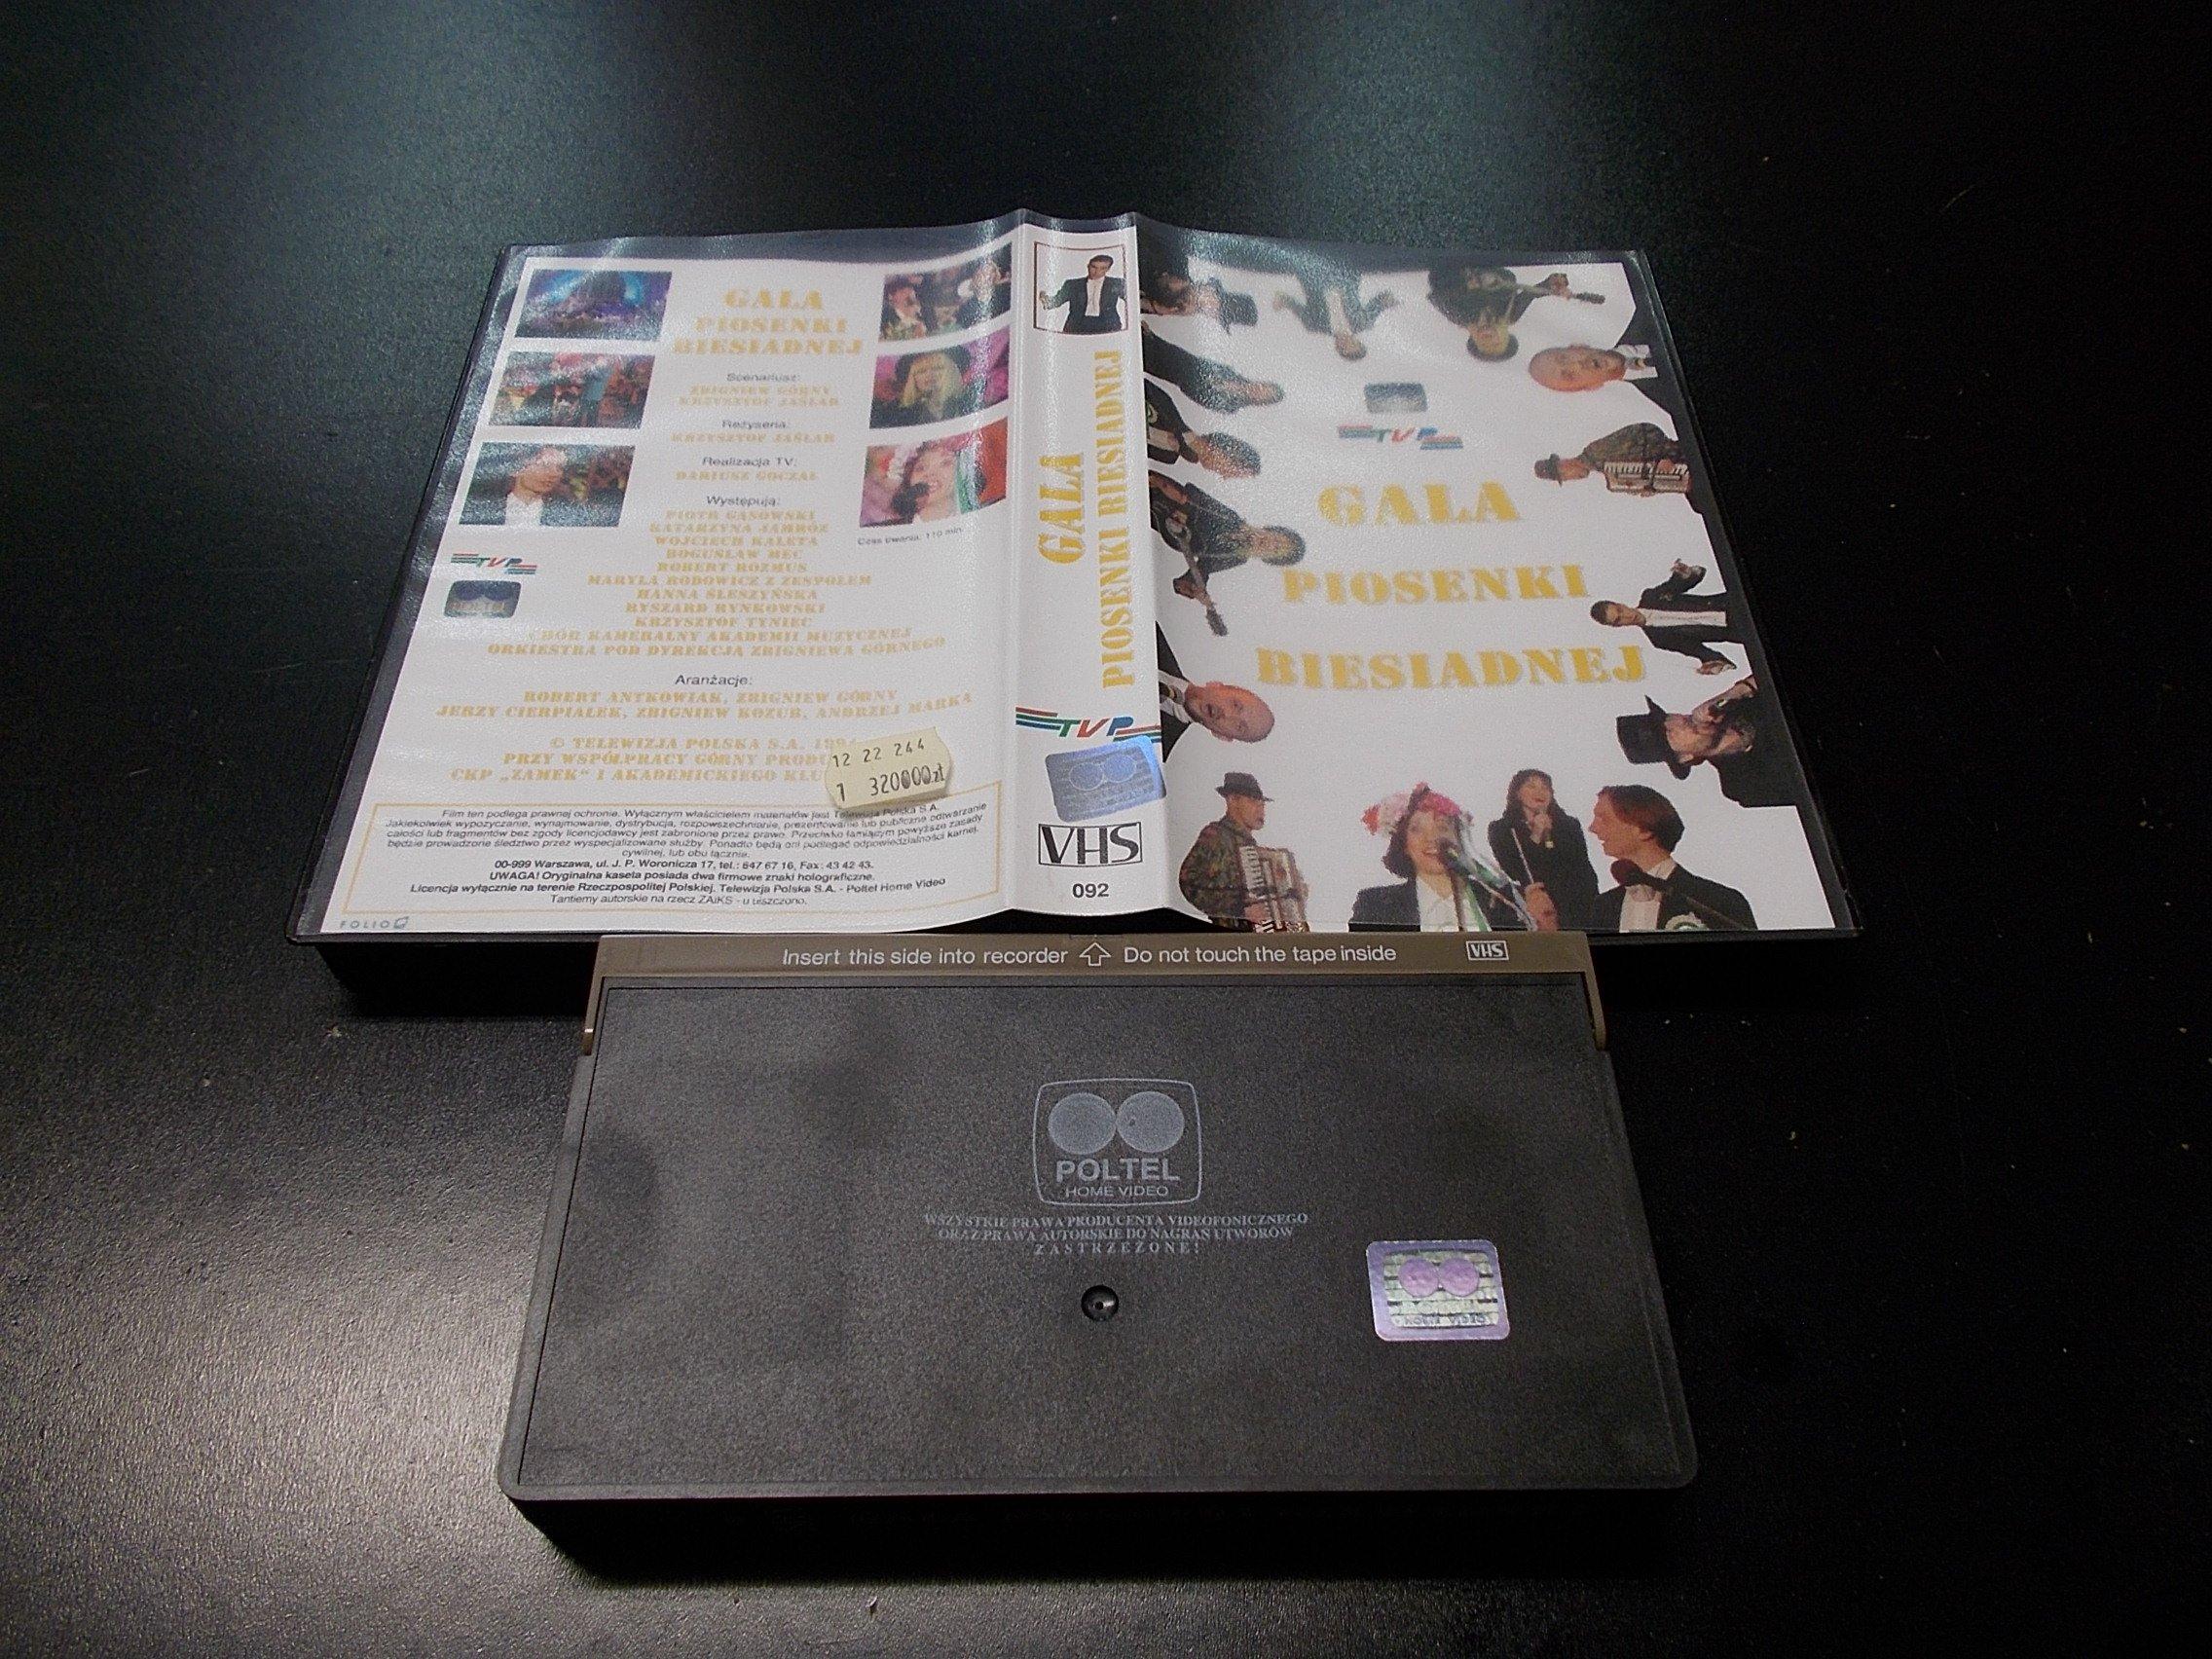 GALA PIOSENKI BIESIADNEJ -  kaseta VHS - 1166 Opole - AlleOpole.pl